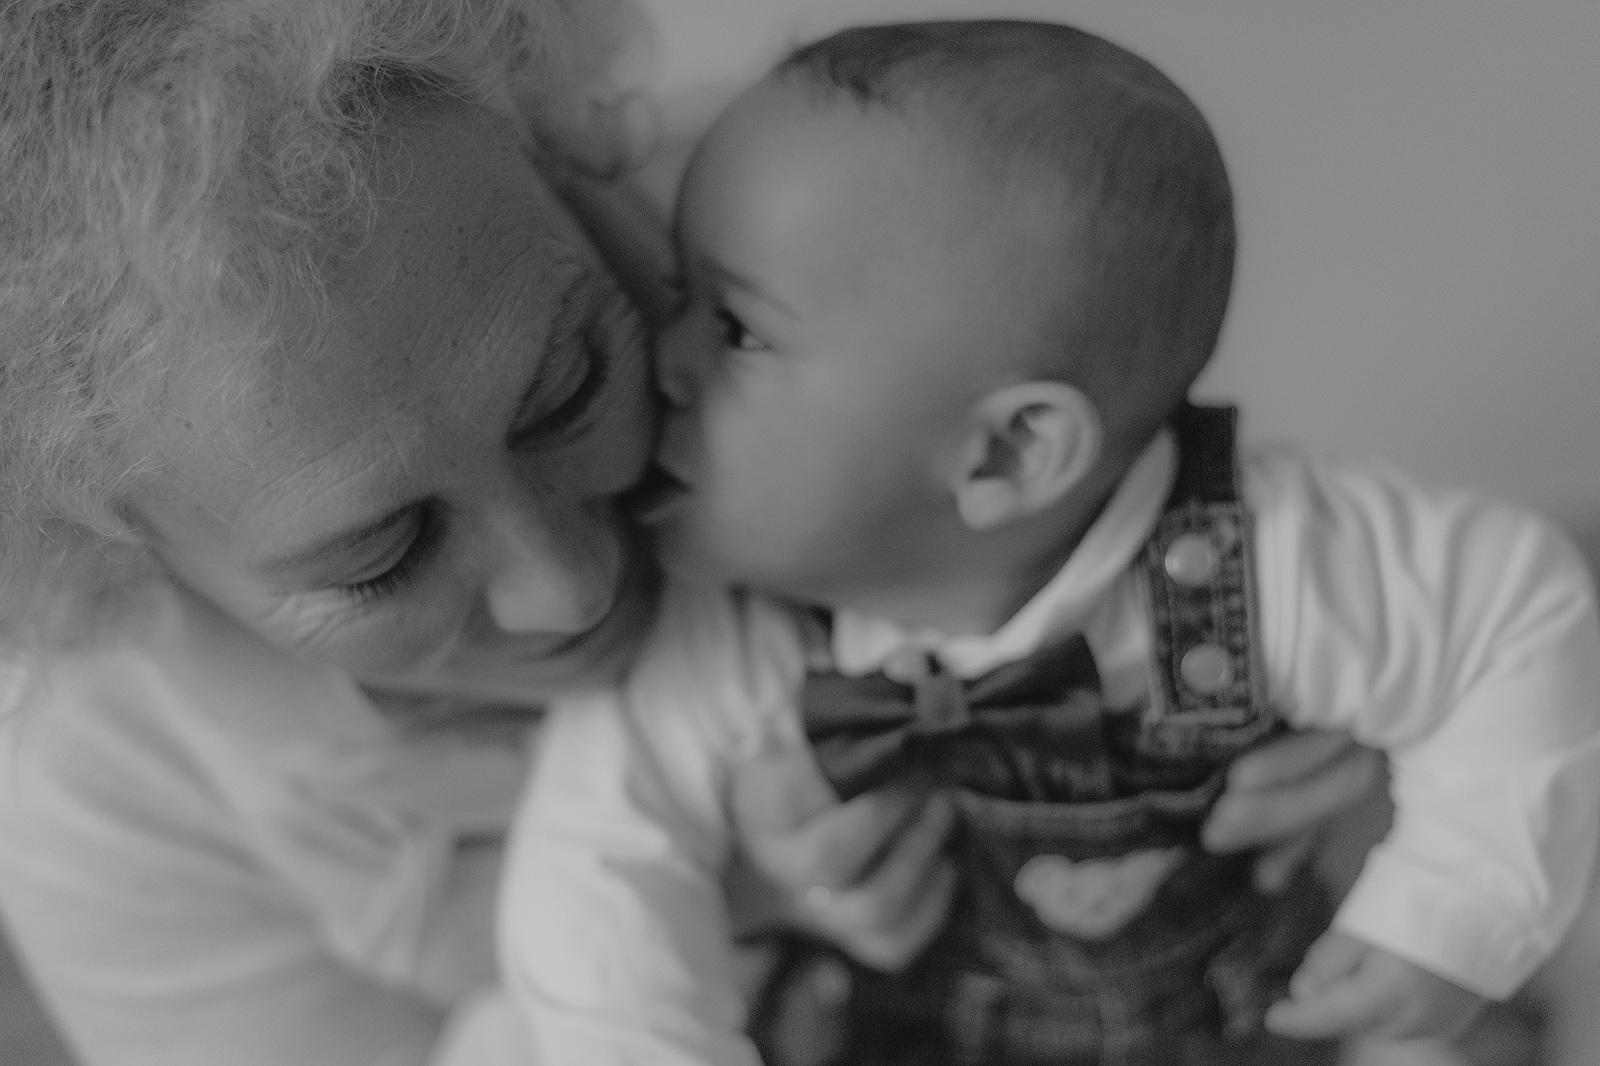 kinderfotograf nidderau babfotografin frankfurt babybilder kinderbilder fotografieren hessen neugeborenenbilder familienbilder bilder mit oma